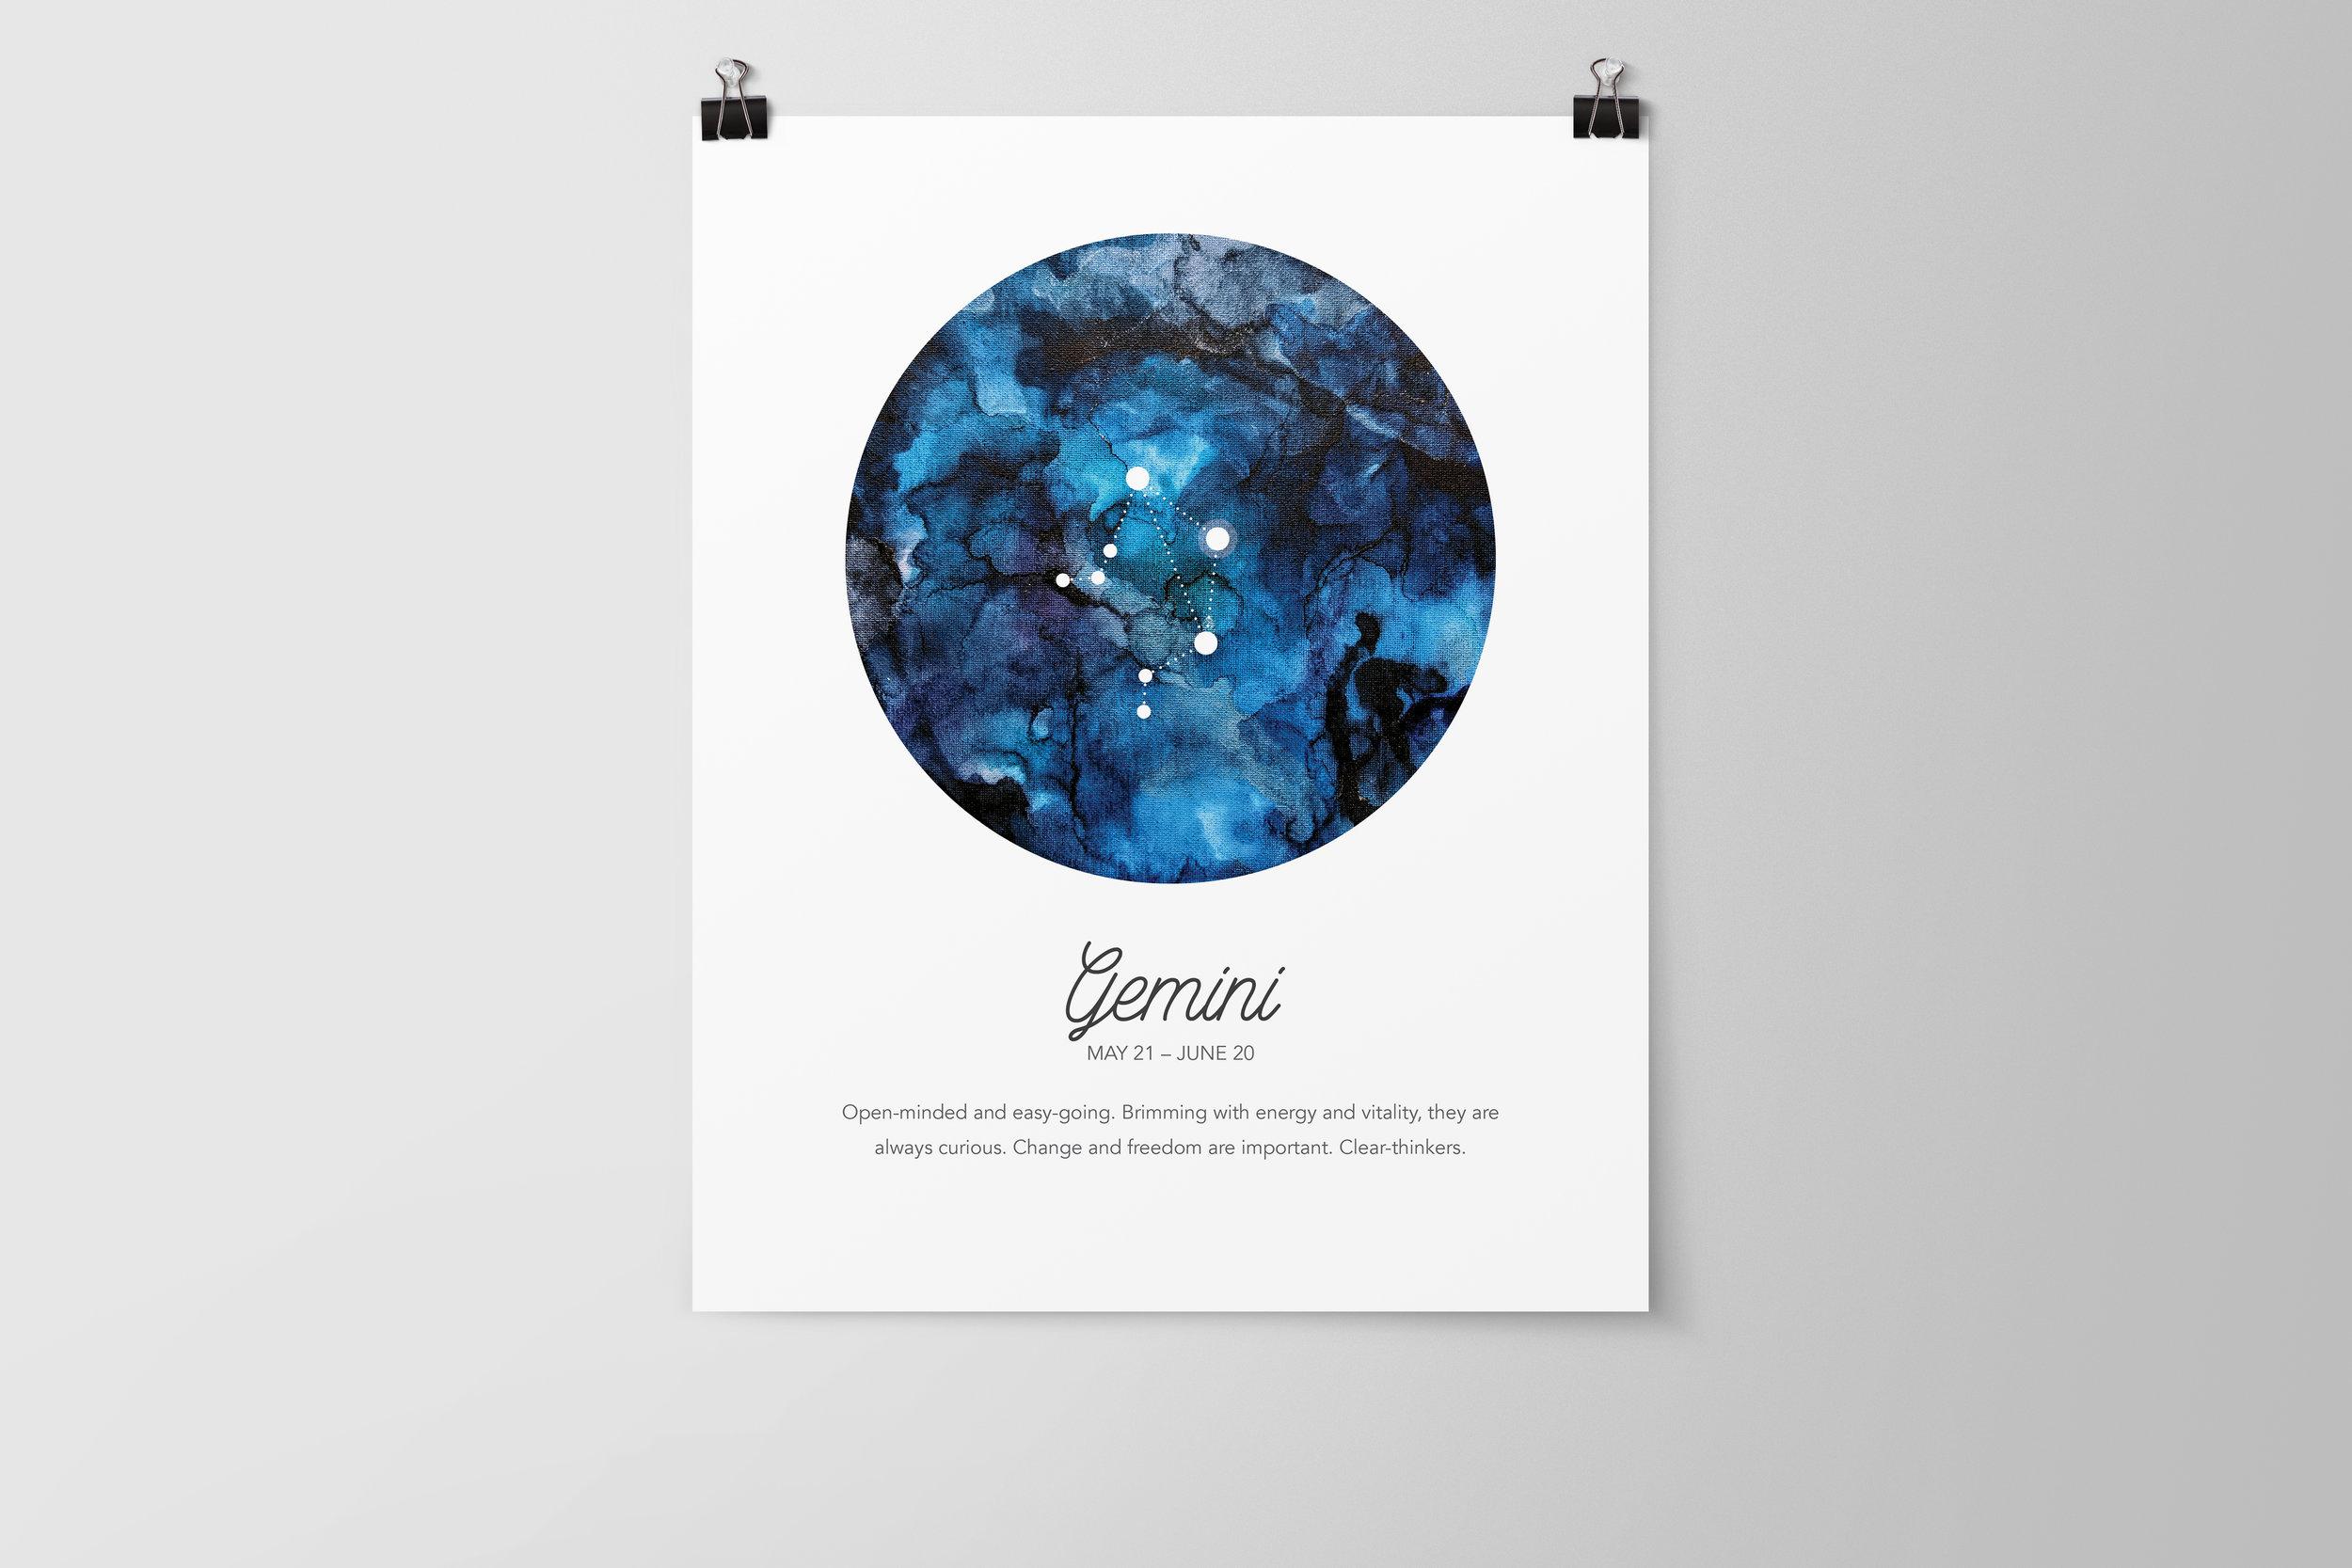 Constellation-Mockup-Gemini.jpg